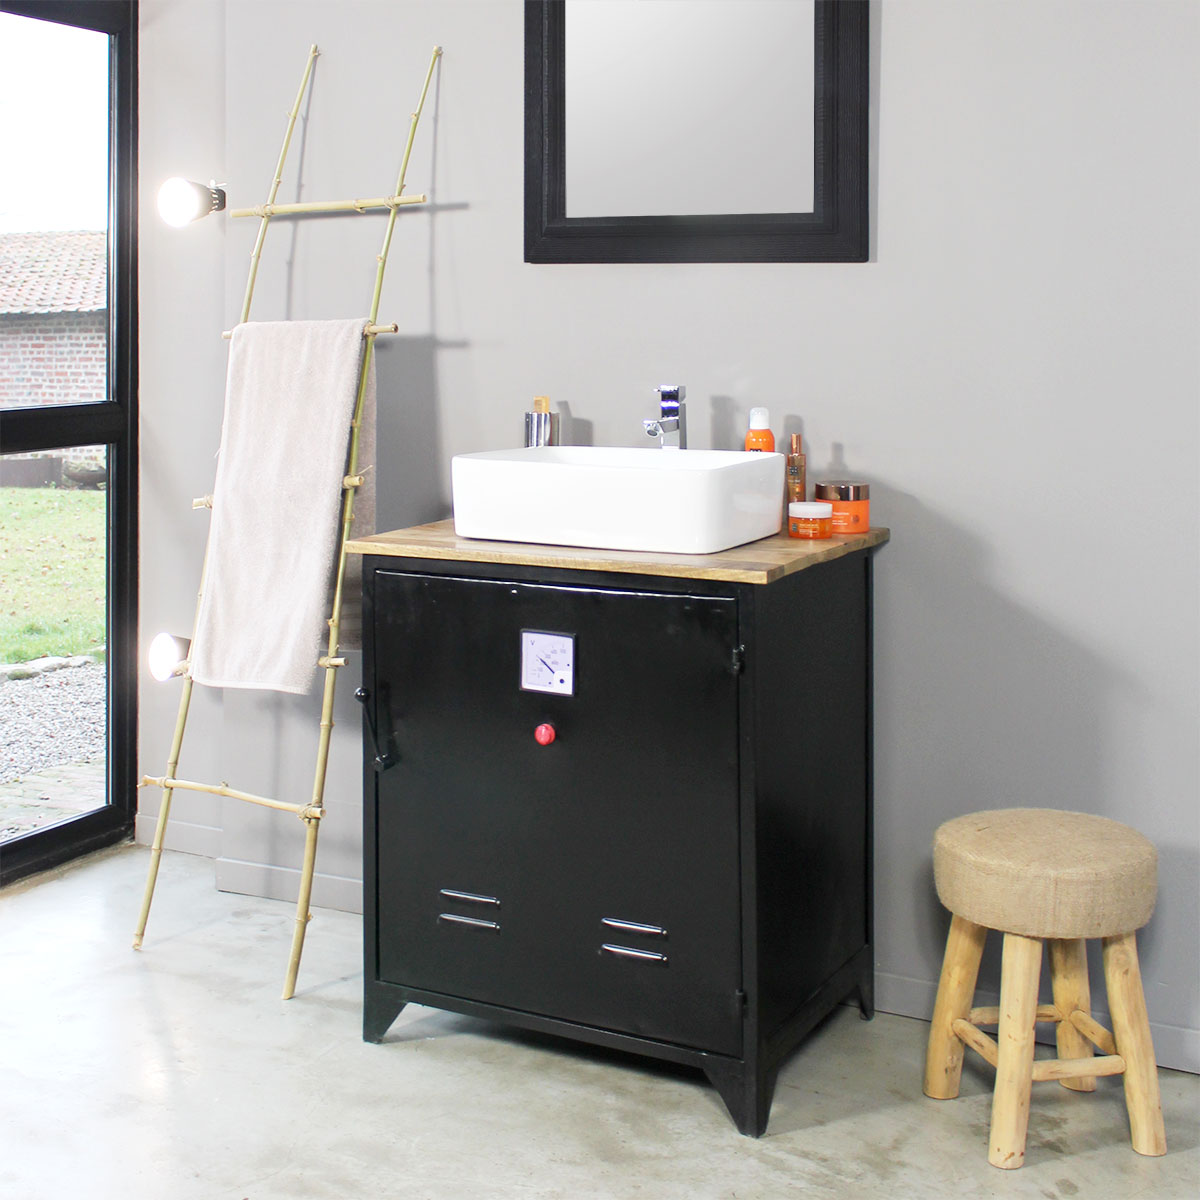 Conseils d co pour choisir son meuble salle de bain metal - Duo mobilier design gagnant jangir maddadi ...